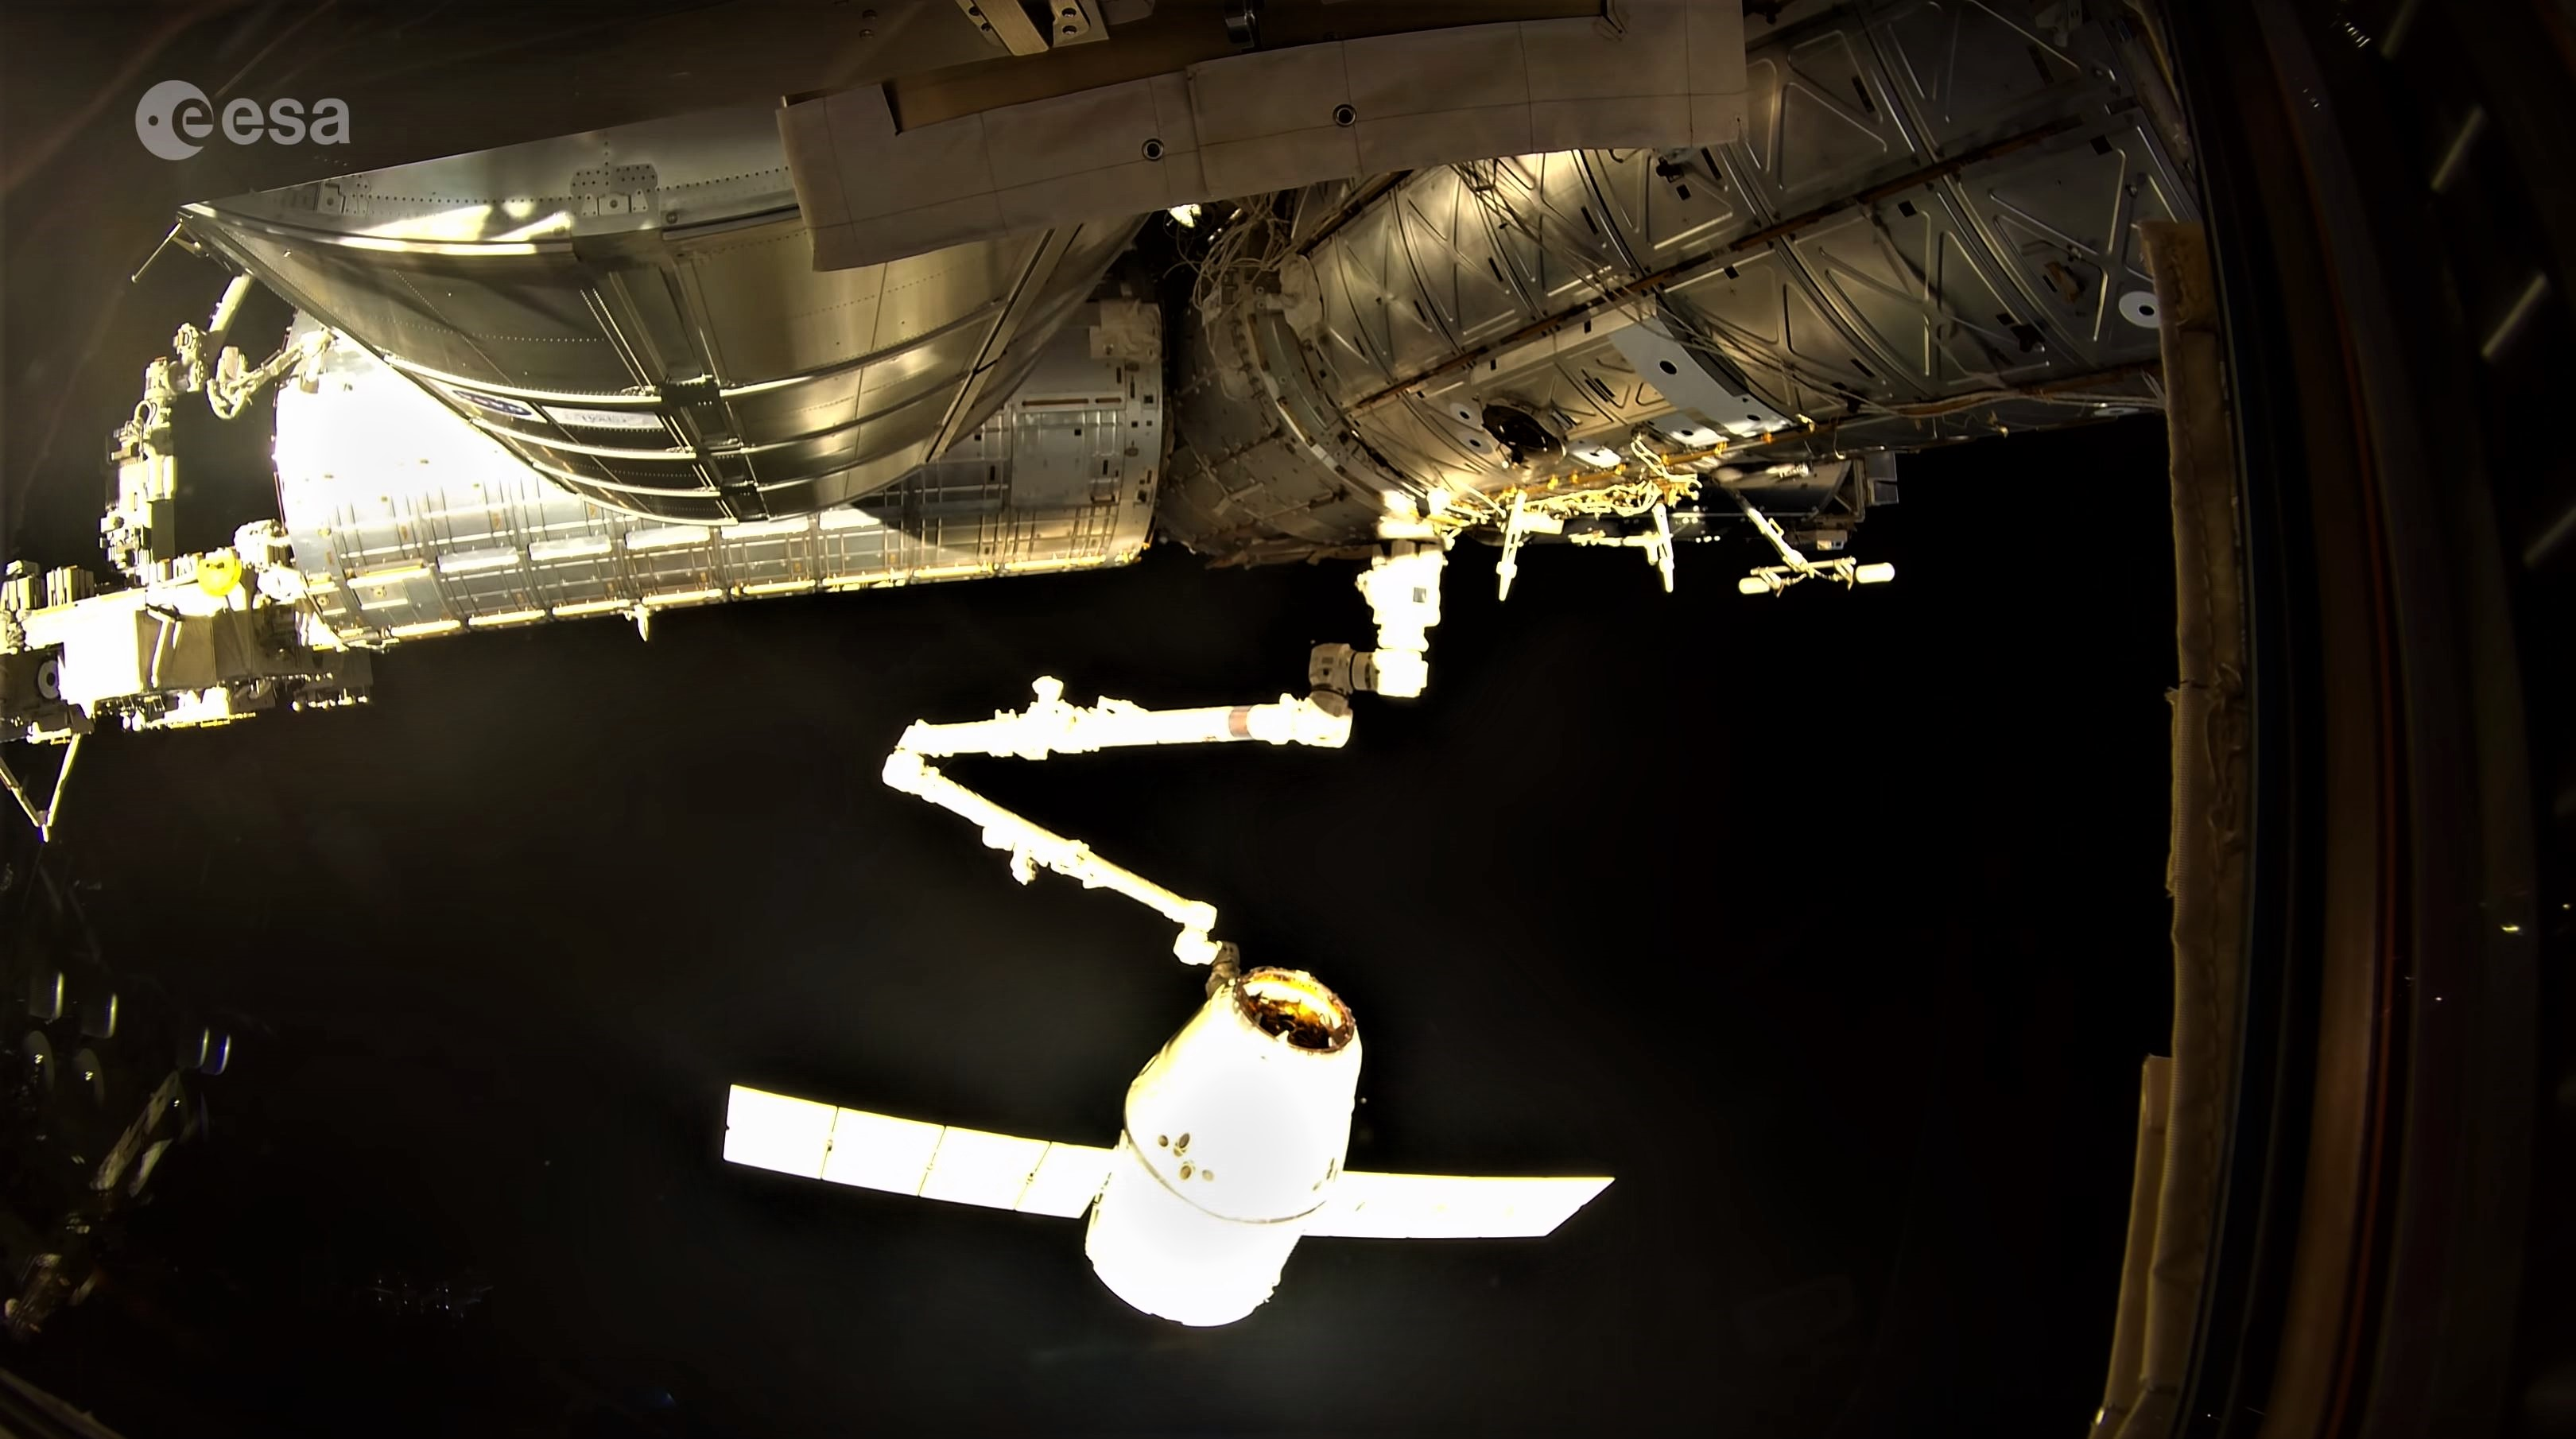 CRS-15 departure 4K (ESA) 4